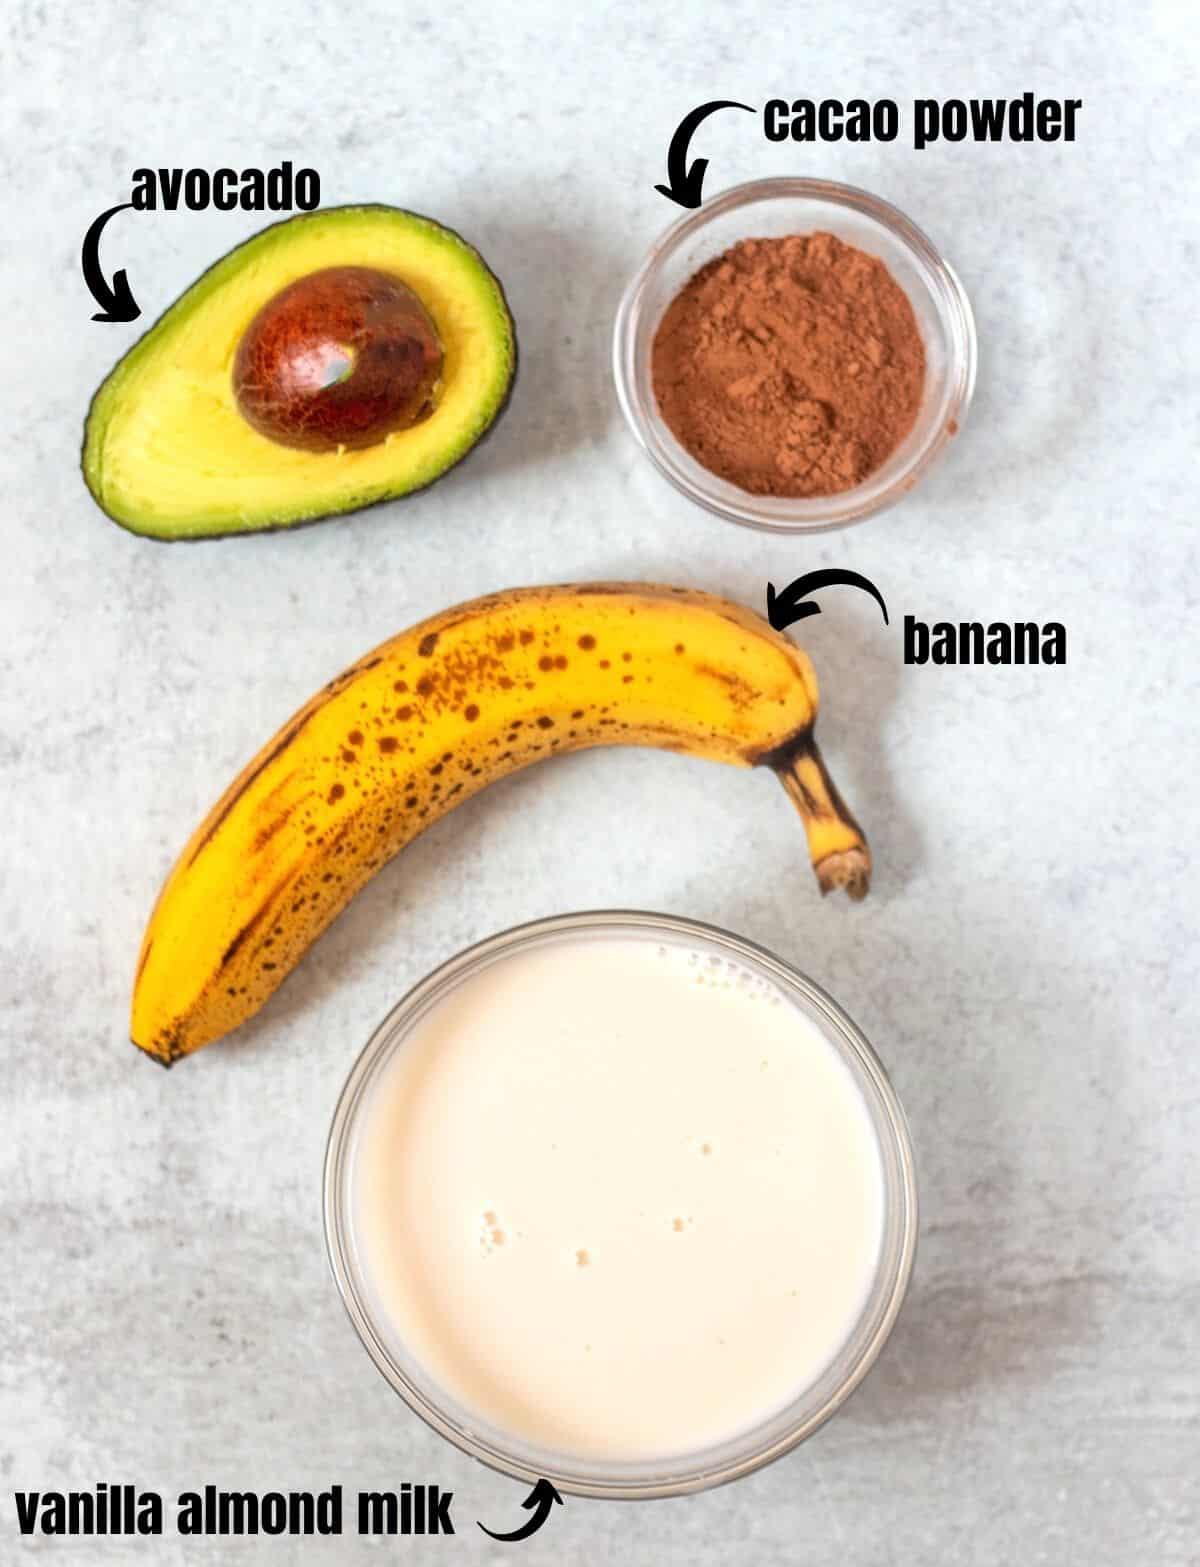 avocado, cacao powder, banana, vanilla almond milk